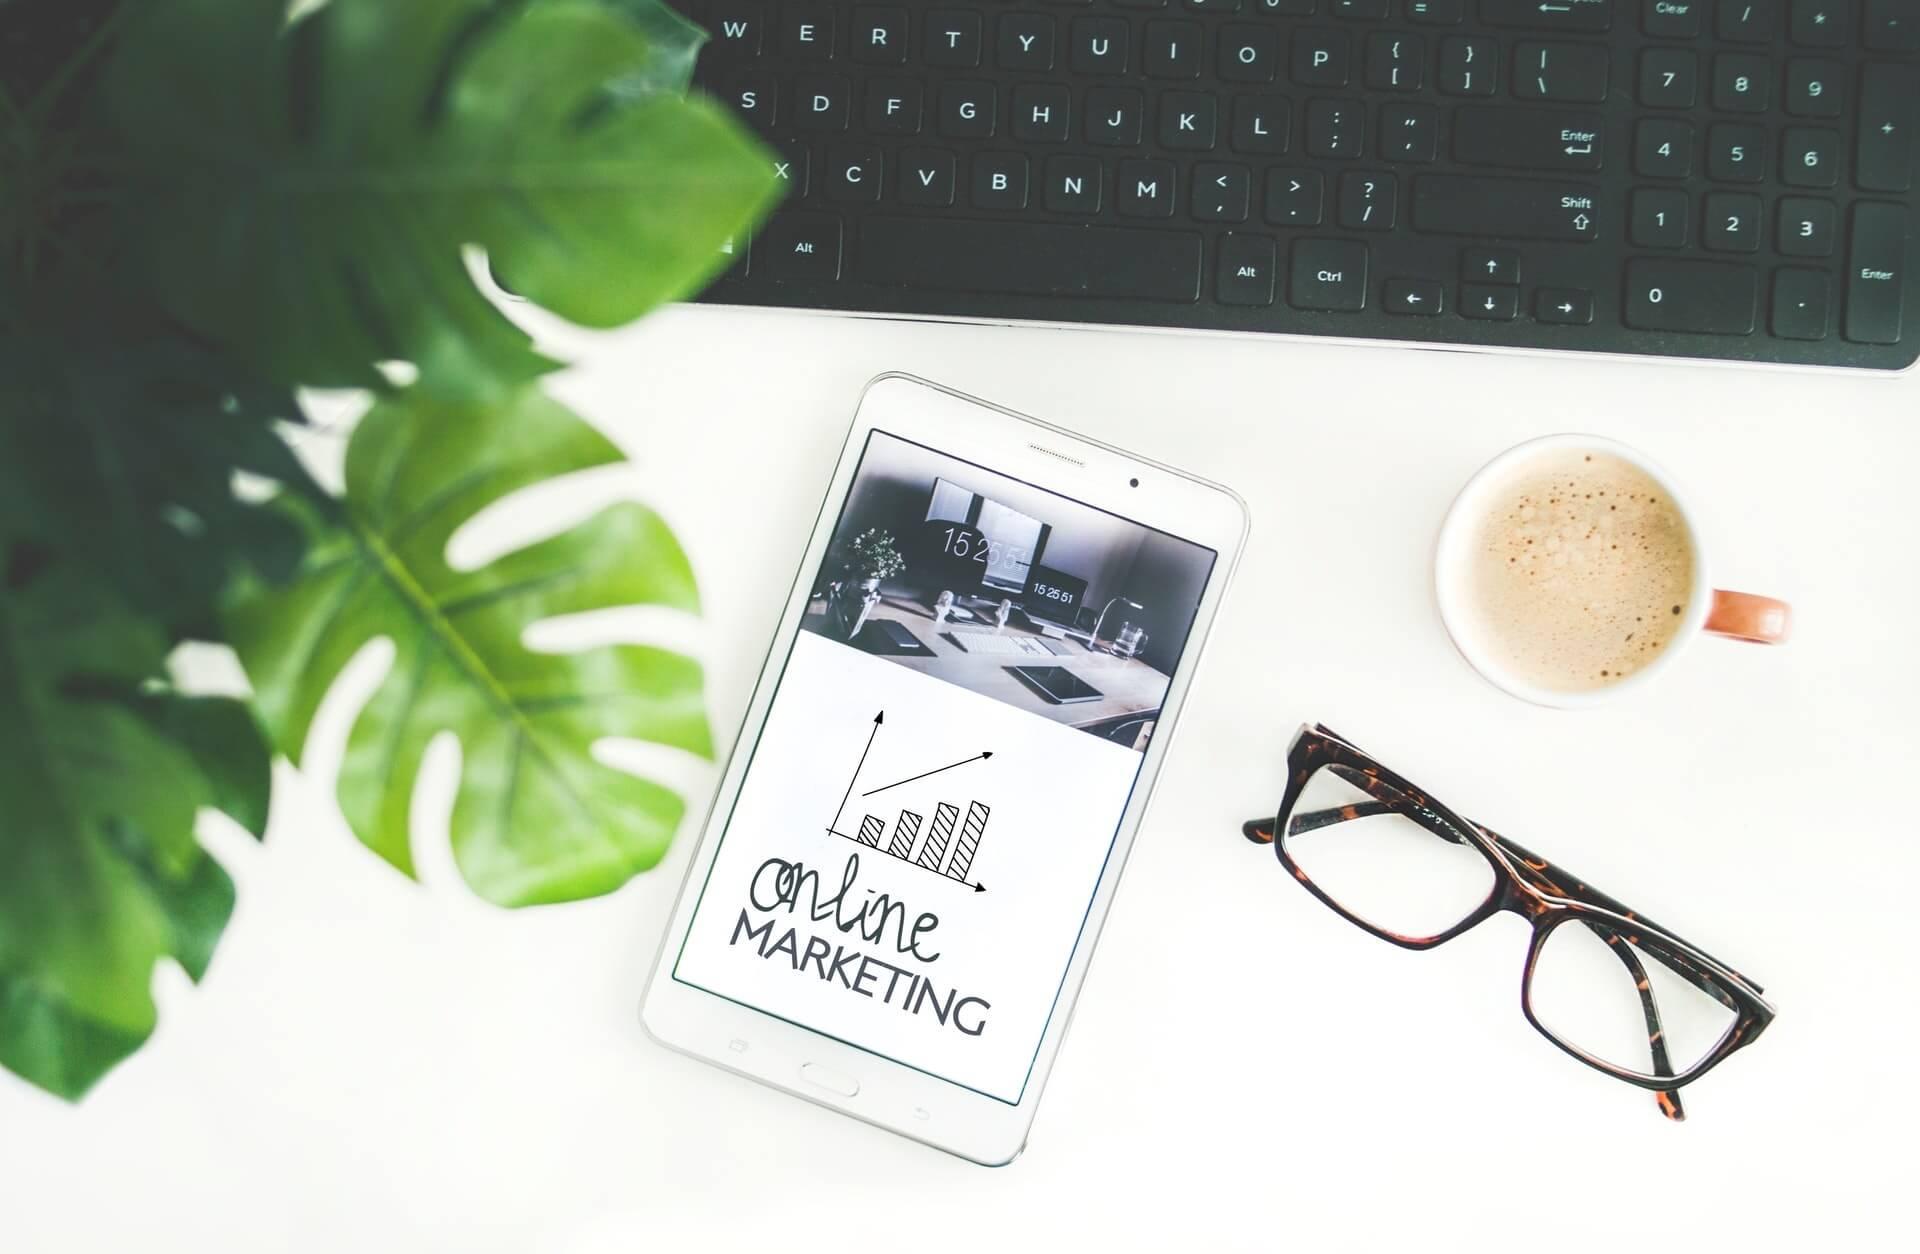 Top 5 Internet marketing